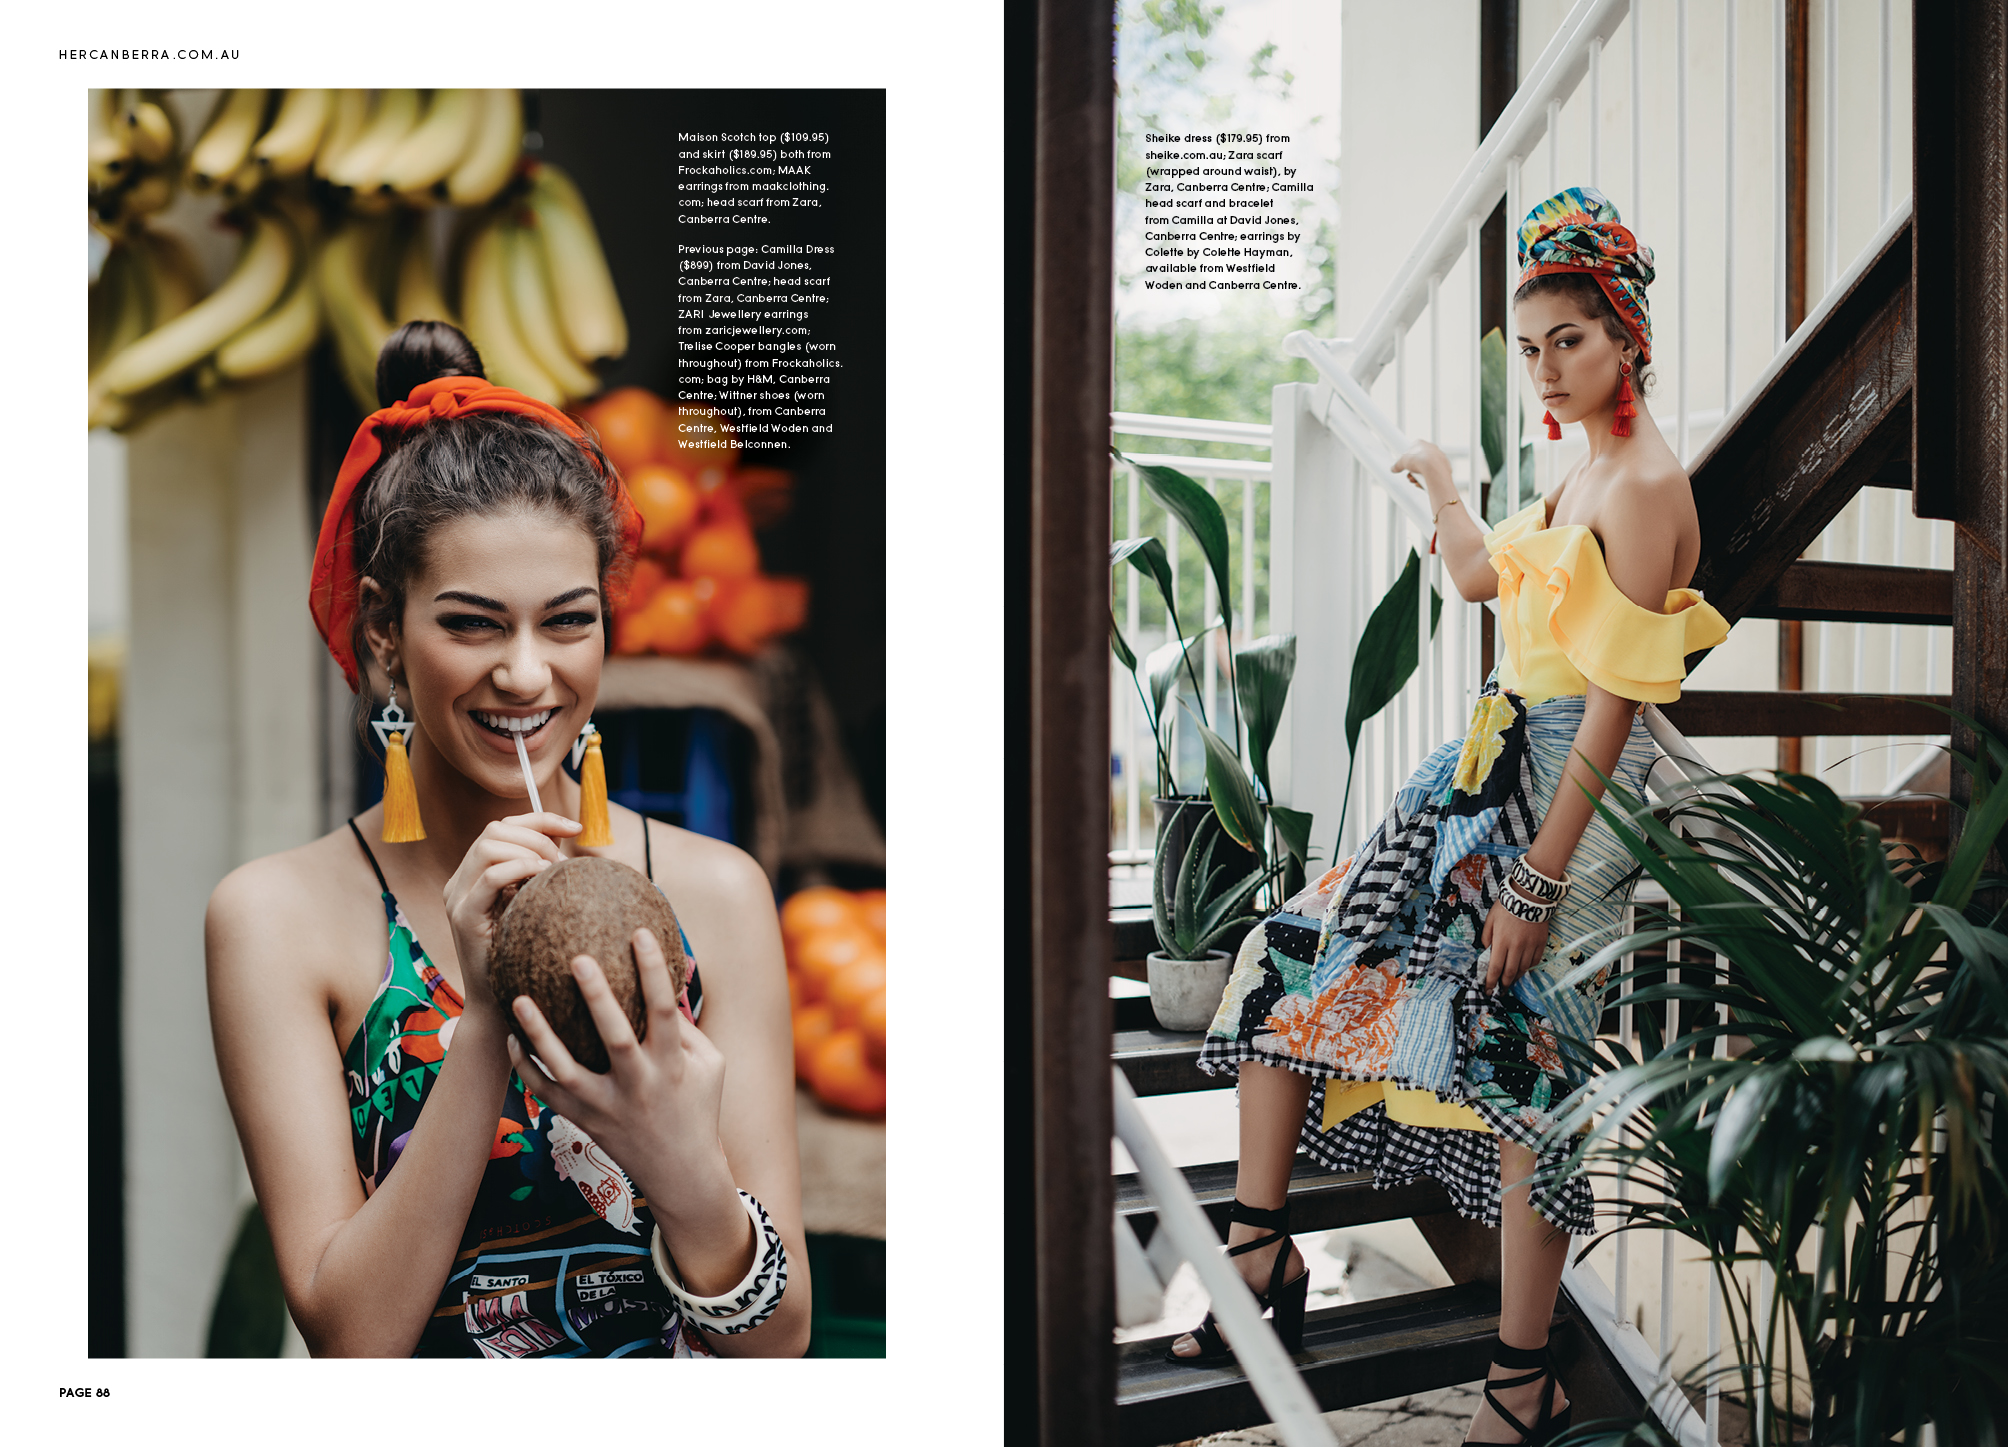 HC_02094_Magazine_Issue_11_Fashion_2.jpg